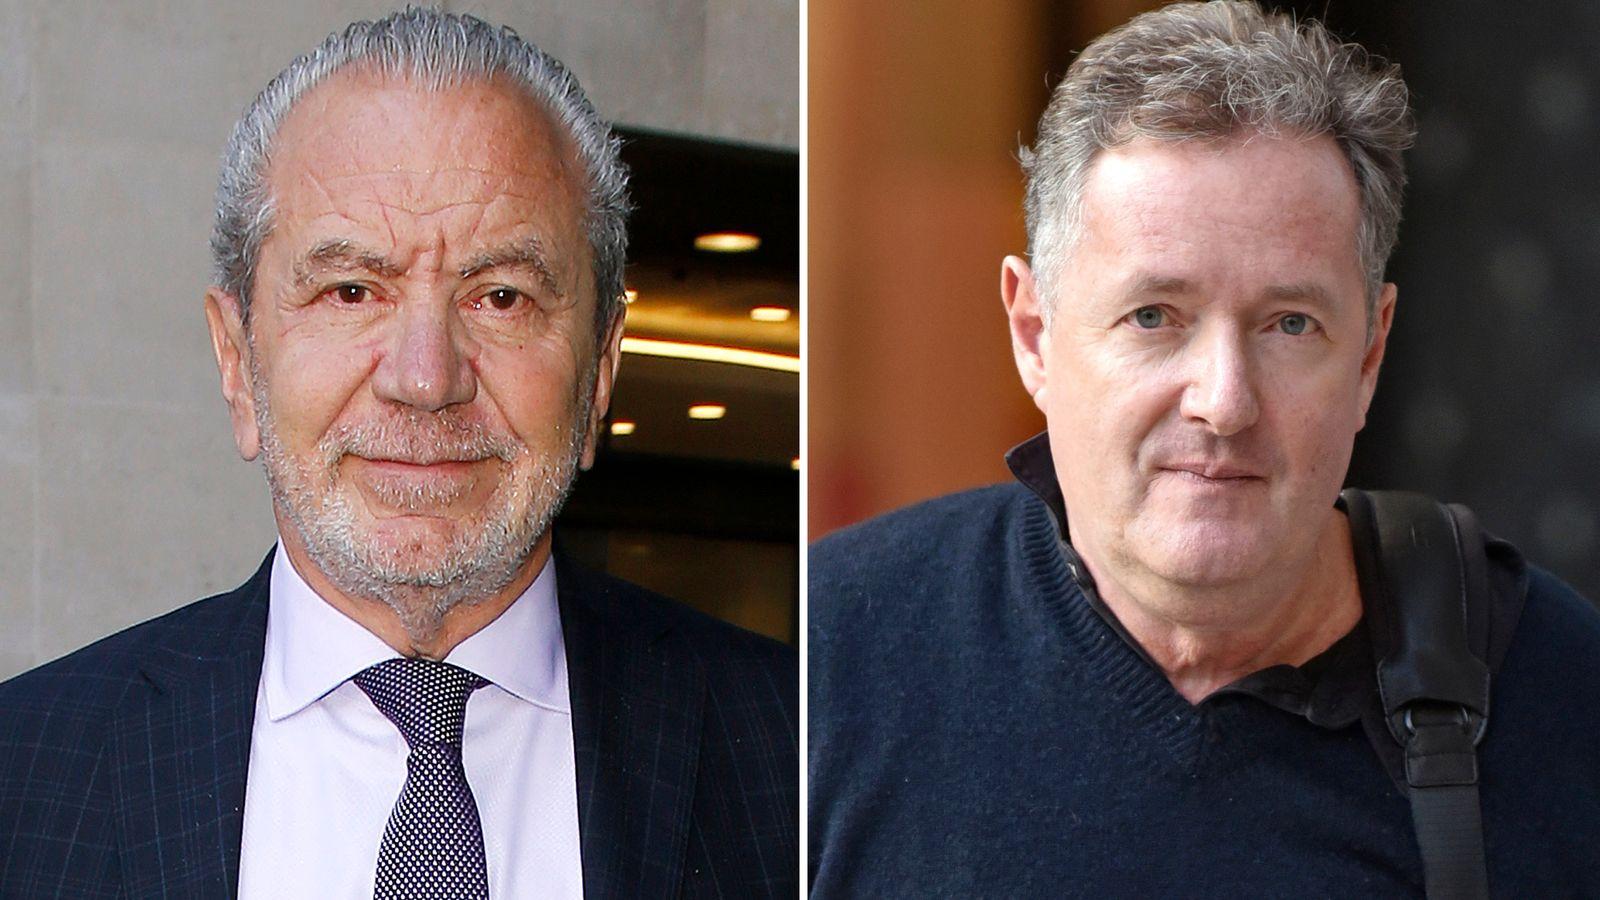 Piers Morgan's lockdown behaviour 'irresponsible and disgusting', Lord Sugar says thumbnail